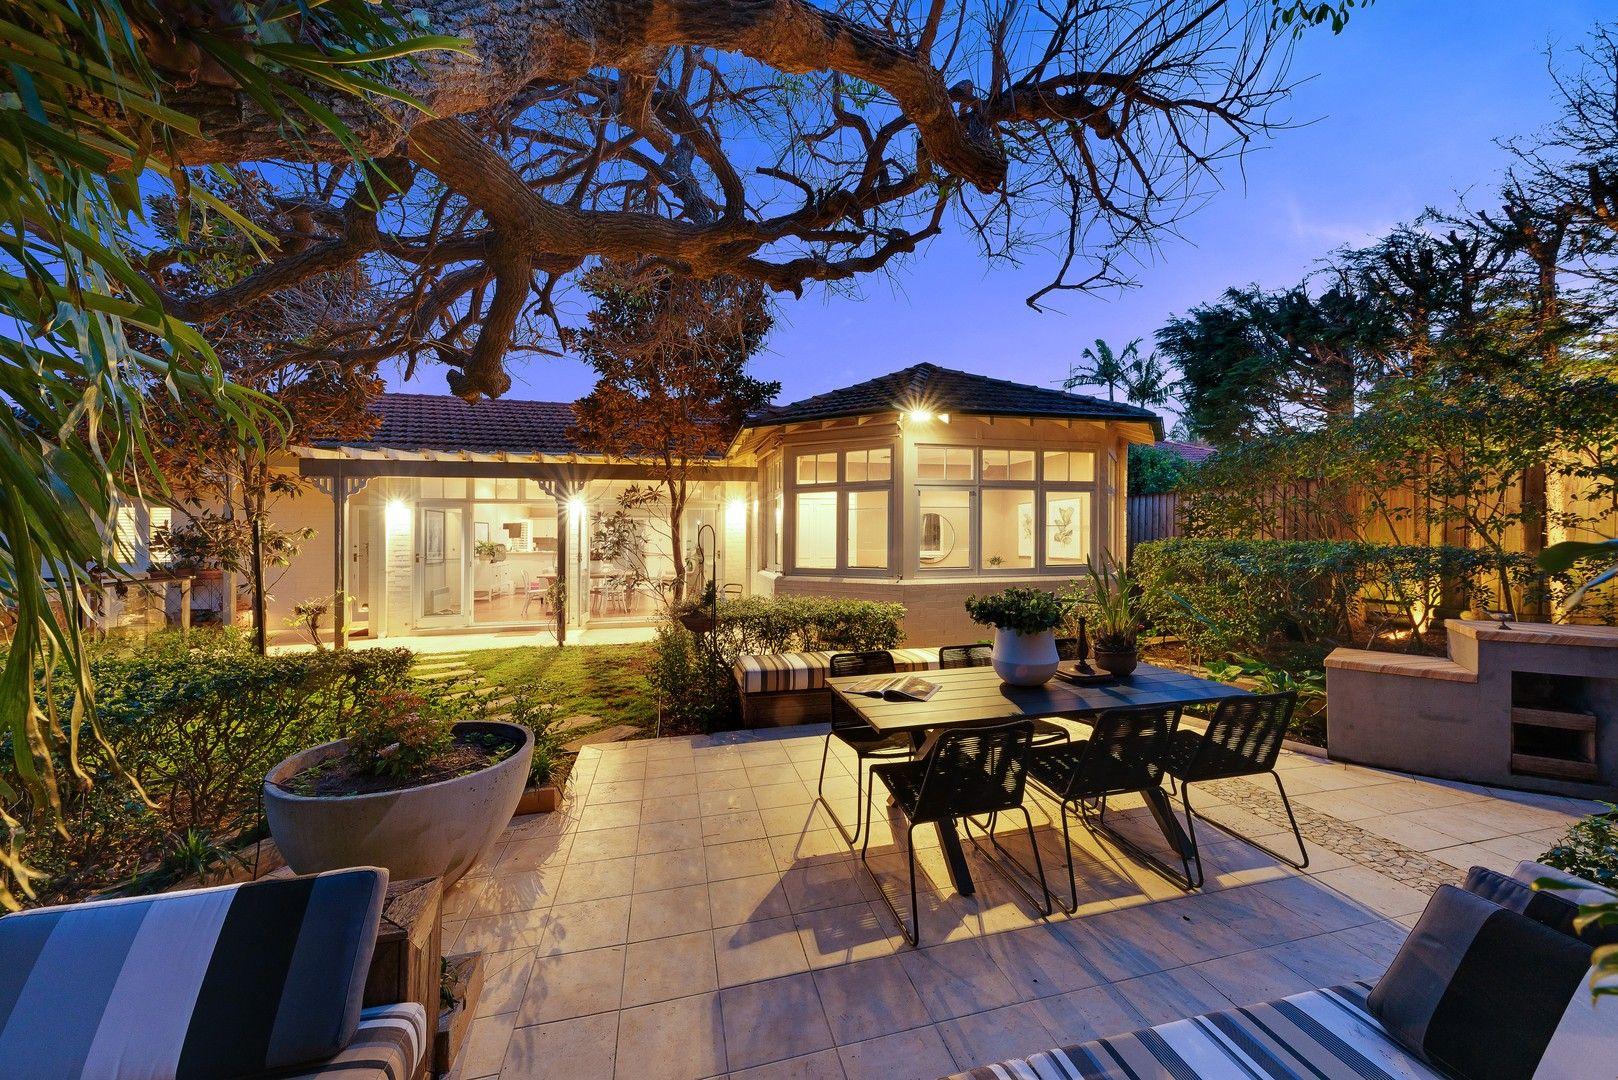 4 bedrooms House in 51 Cliff Avenue NORTHBRIDGE NSW, 2063